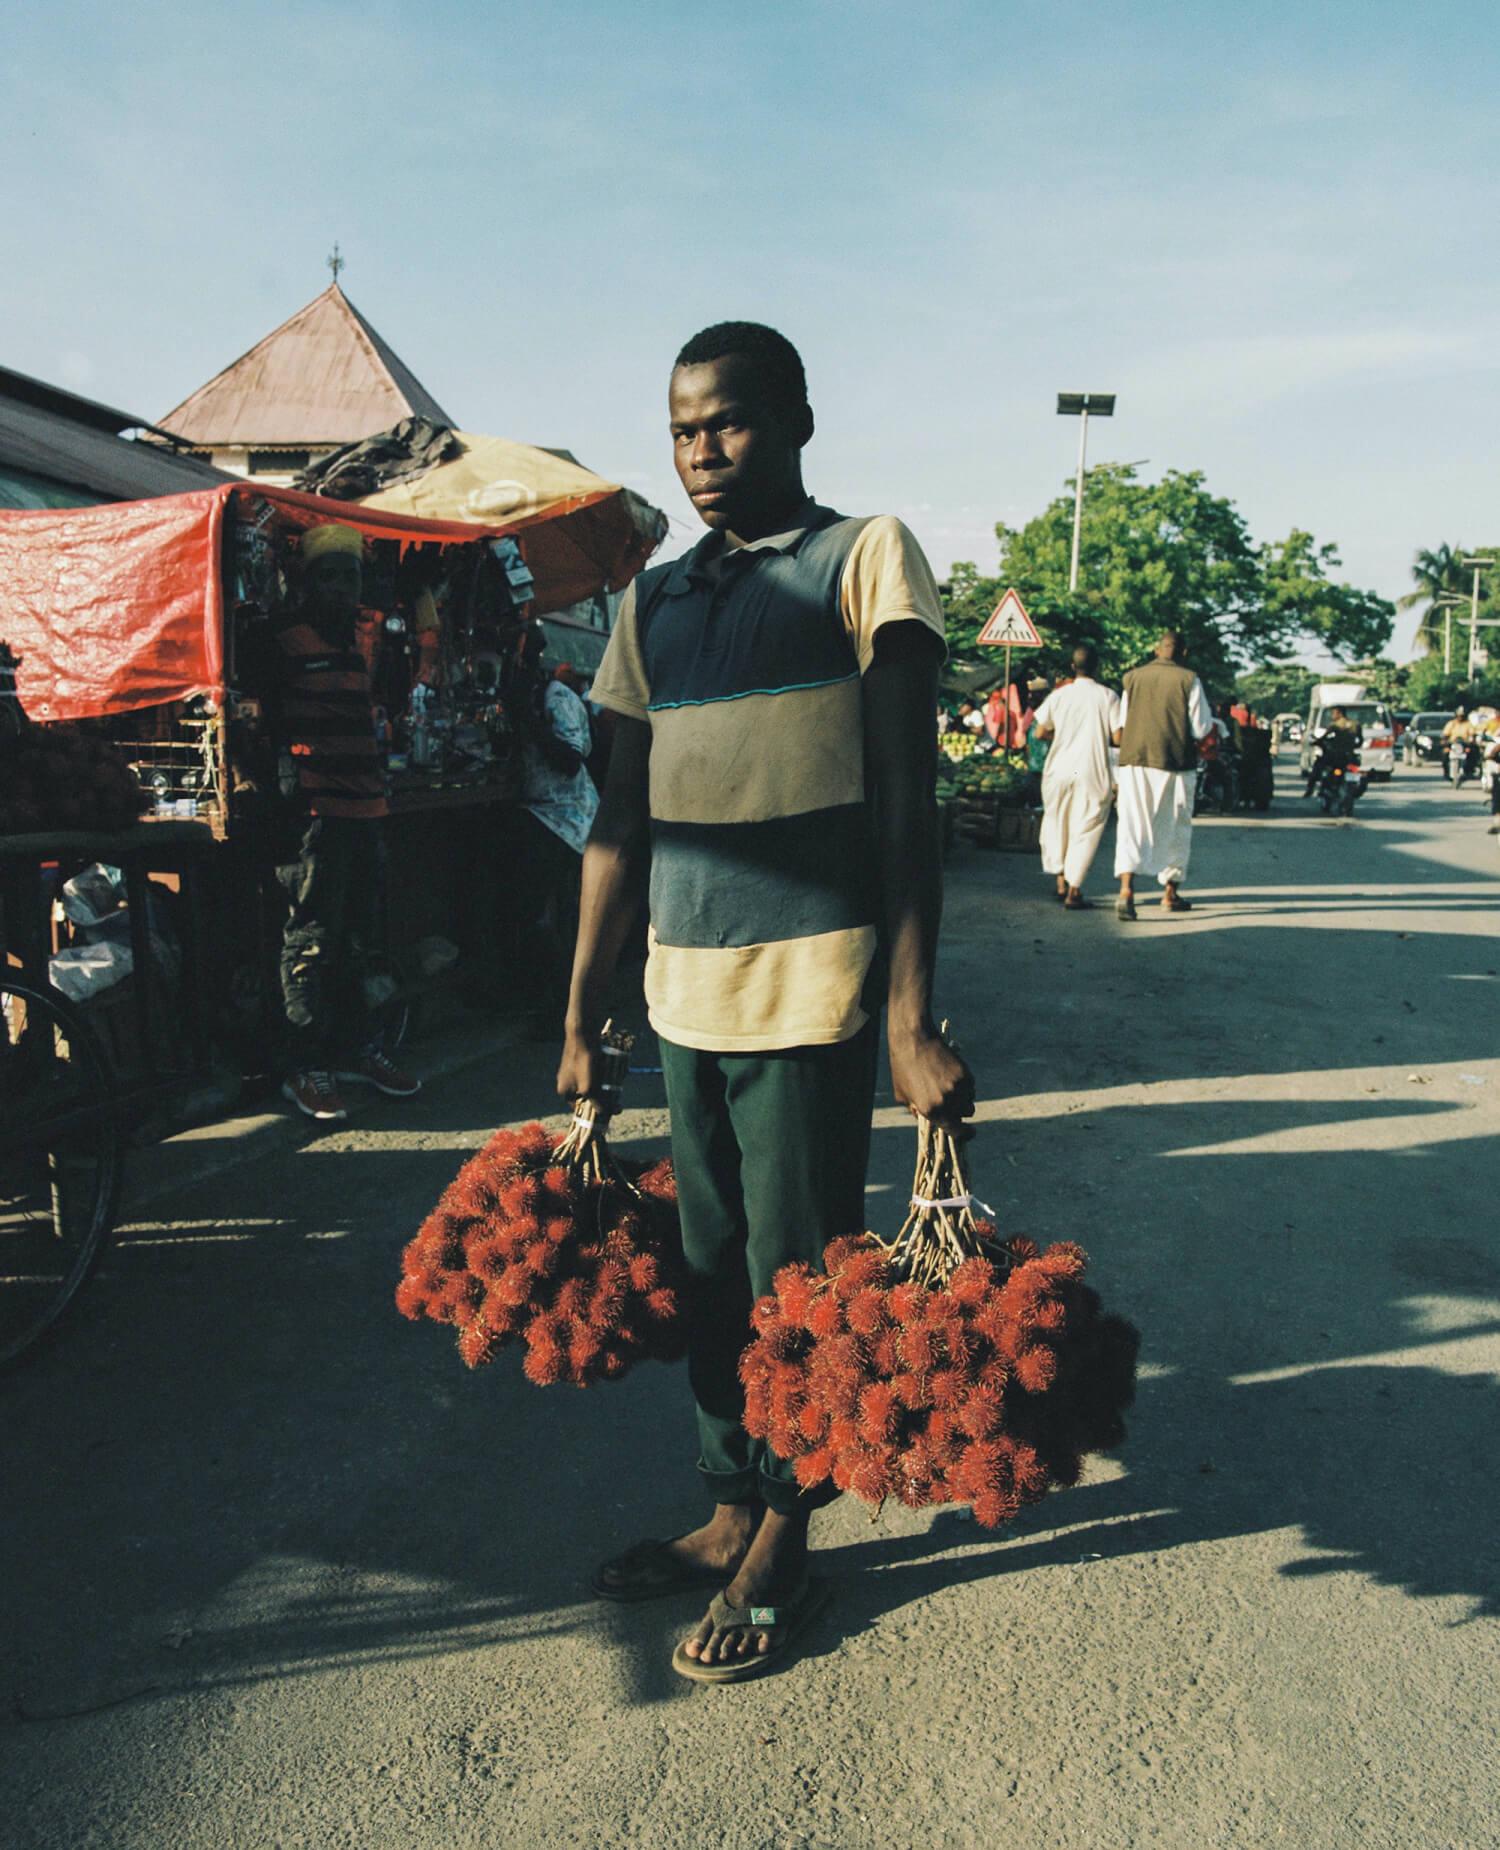 """A day is short in Africa"". Fotografía: Carl van der Linde"